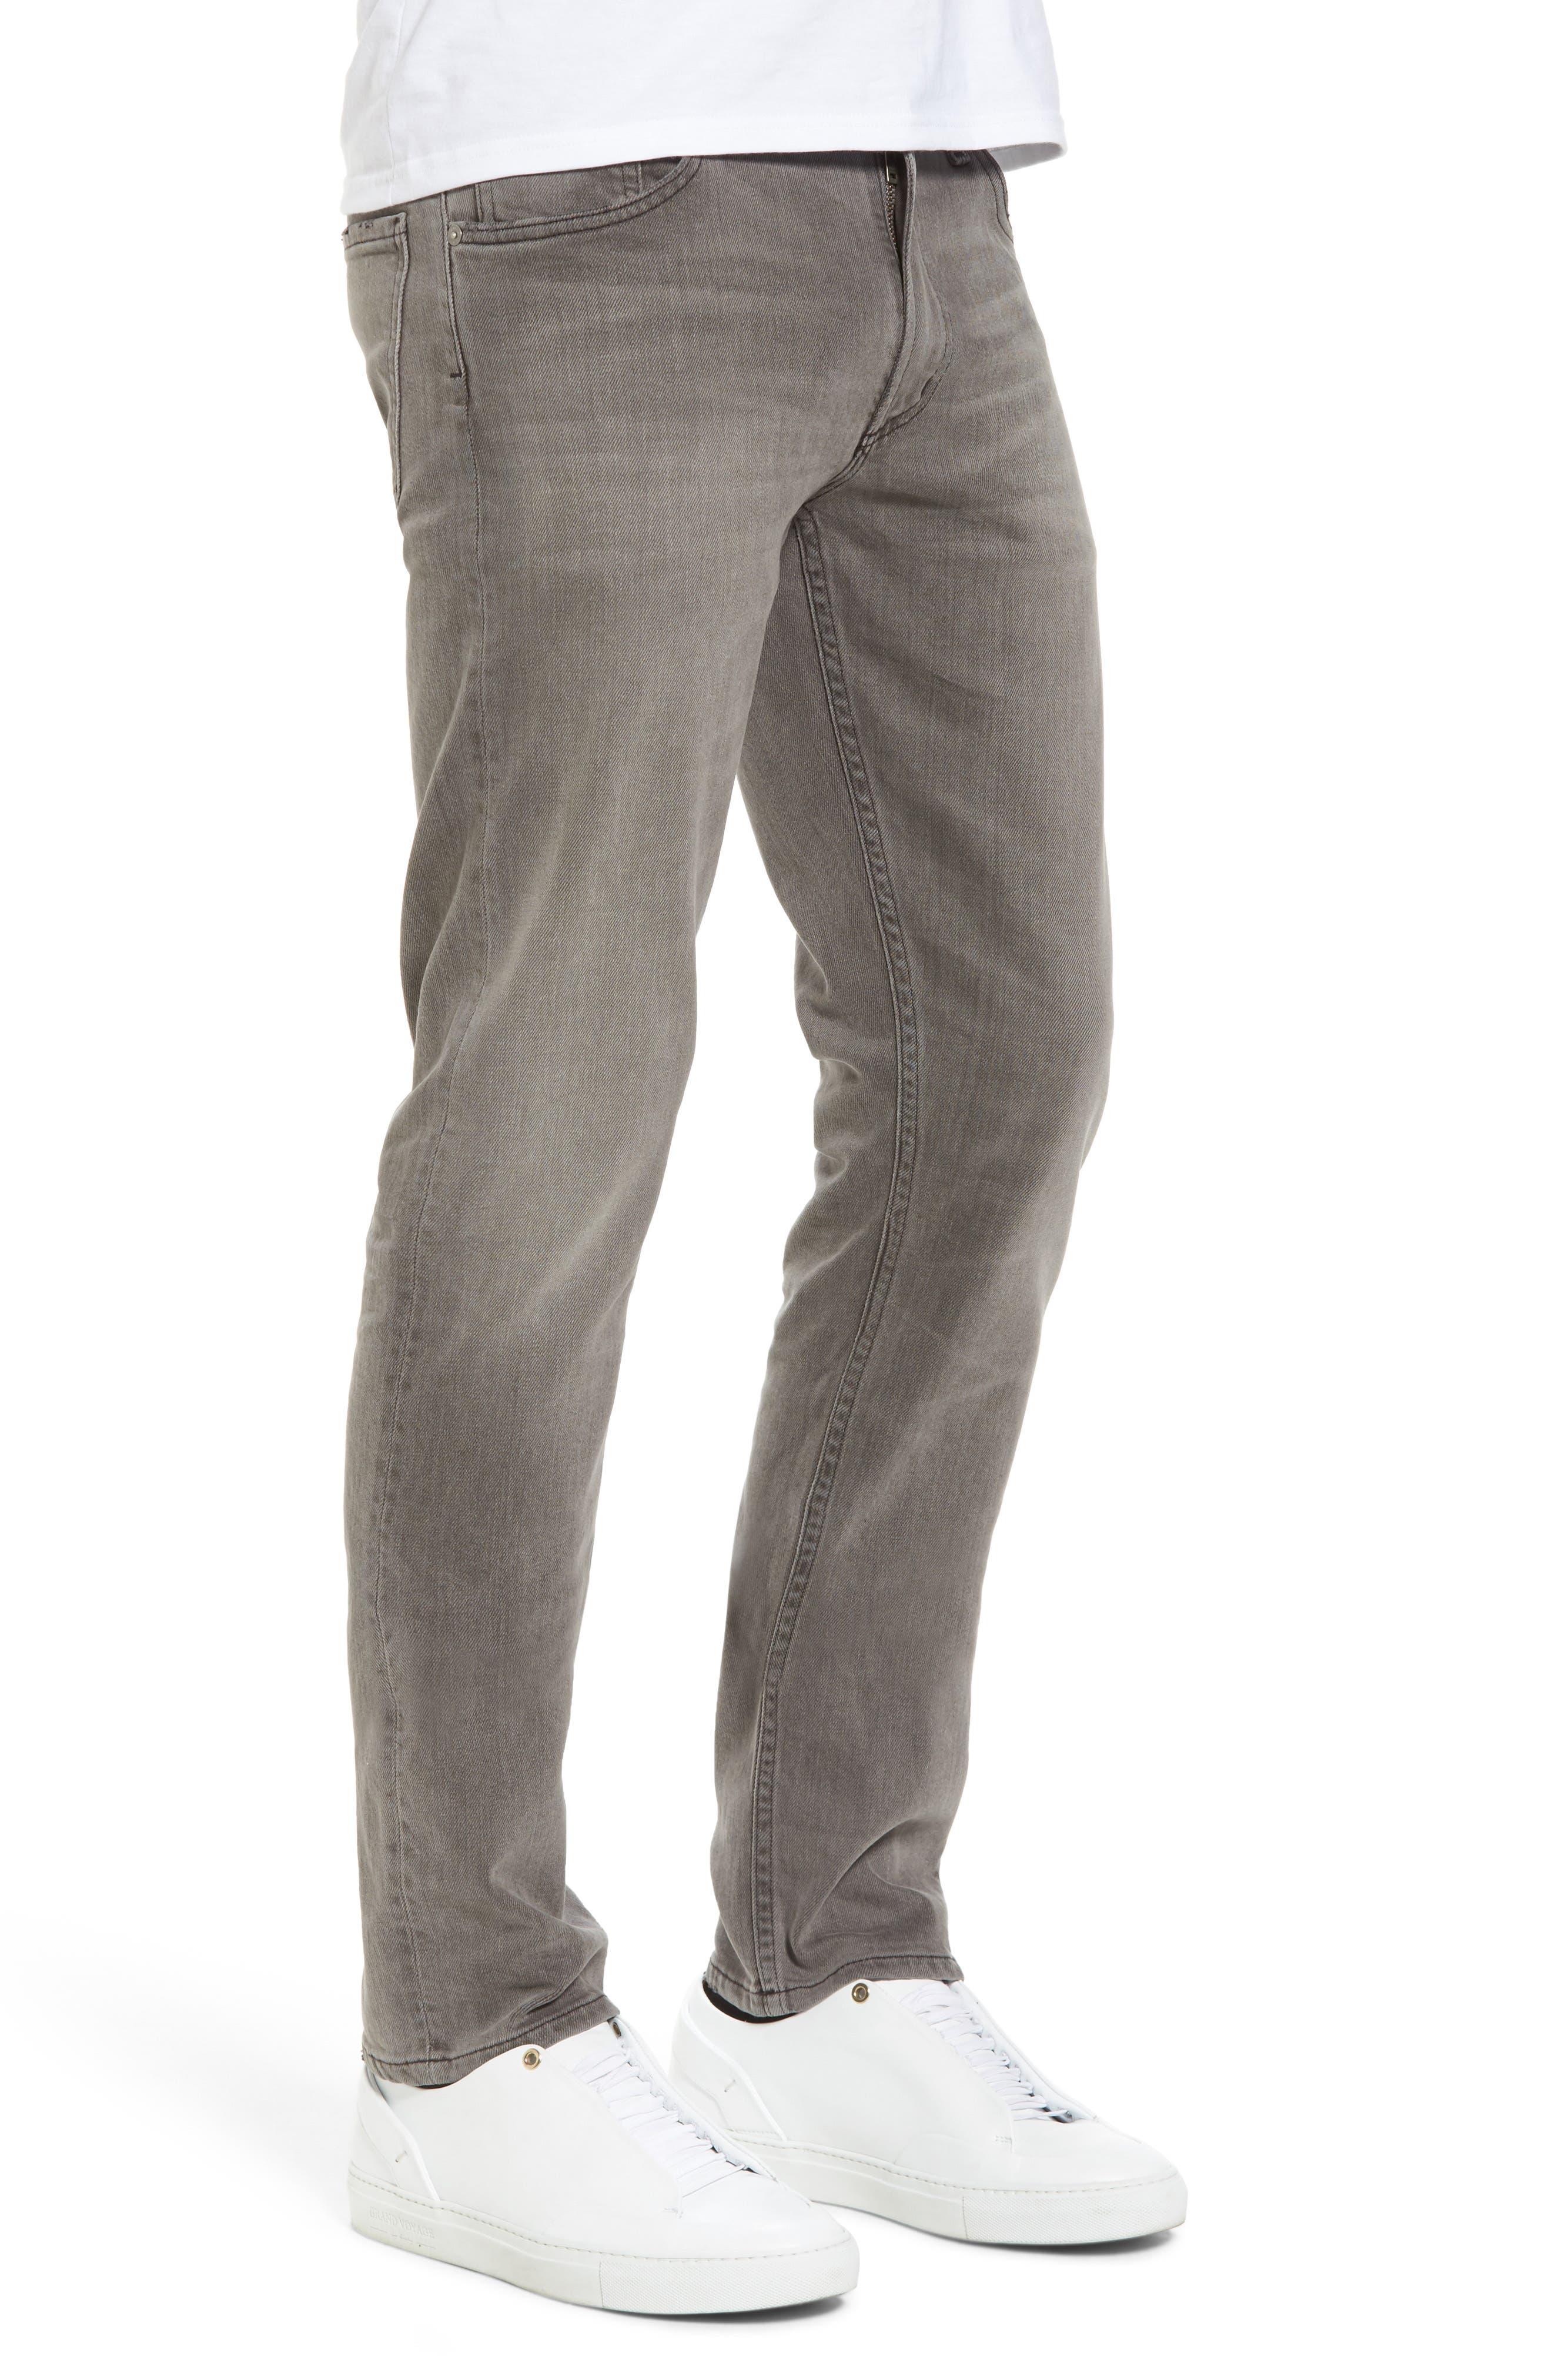 Bowery Slim Fit Jeans,                             Alternate thumbnail 3, color,                             Leon